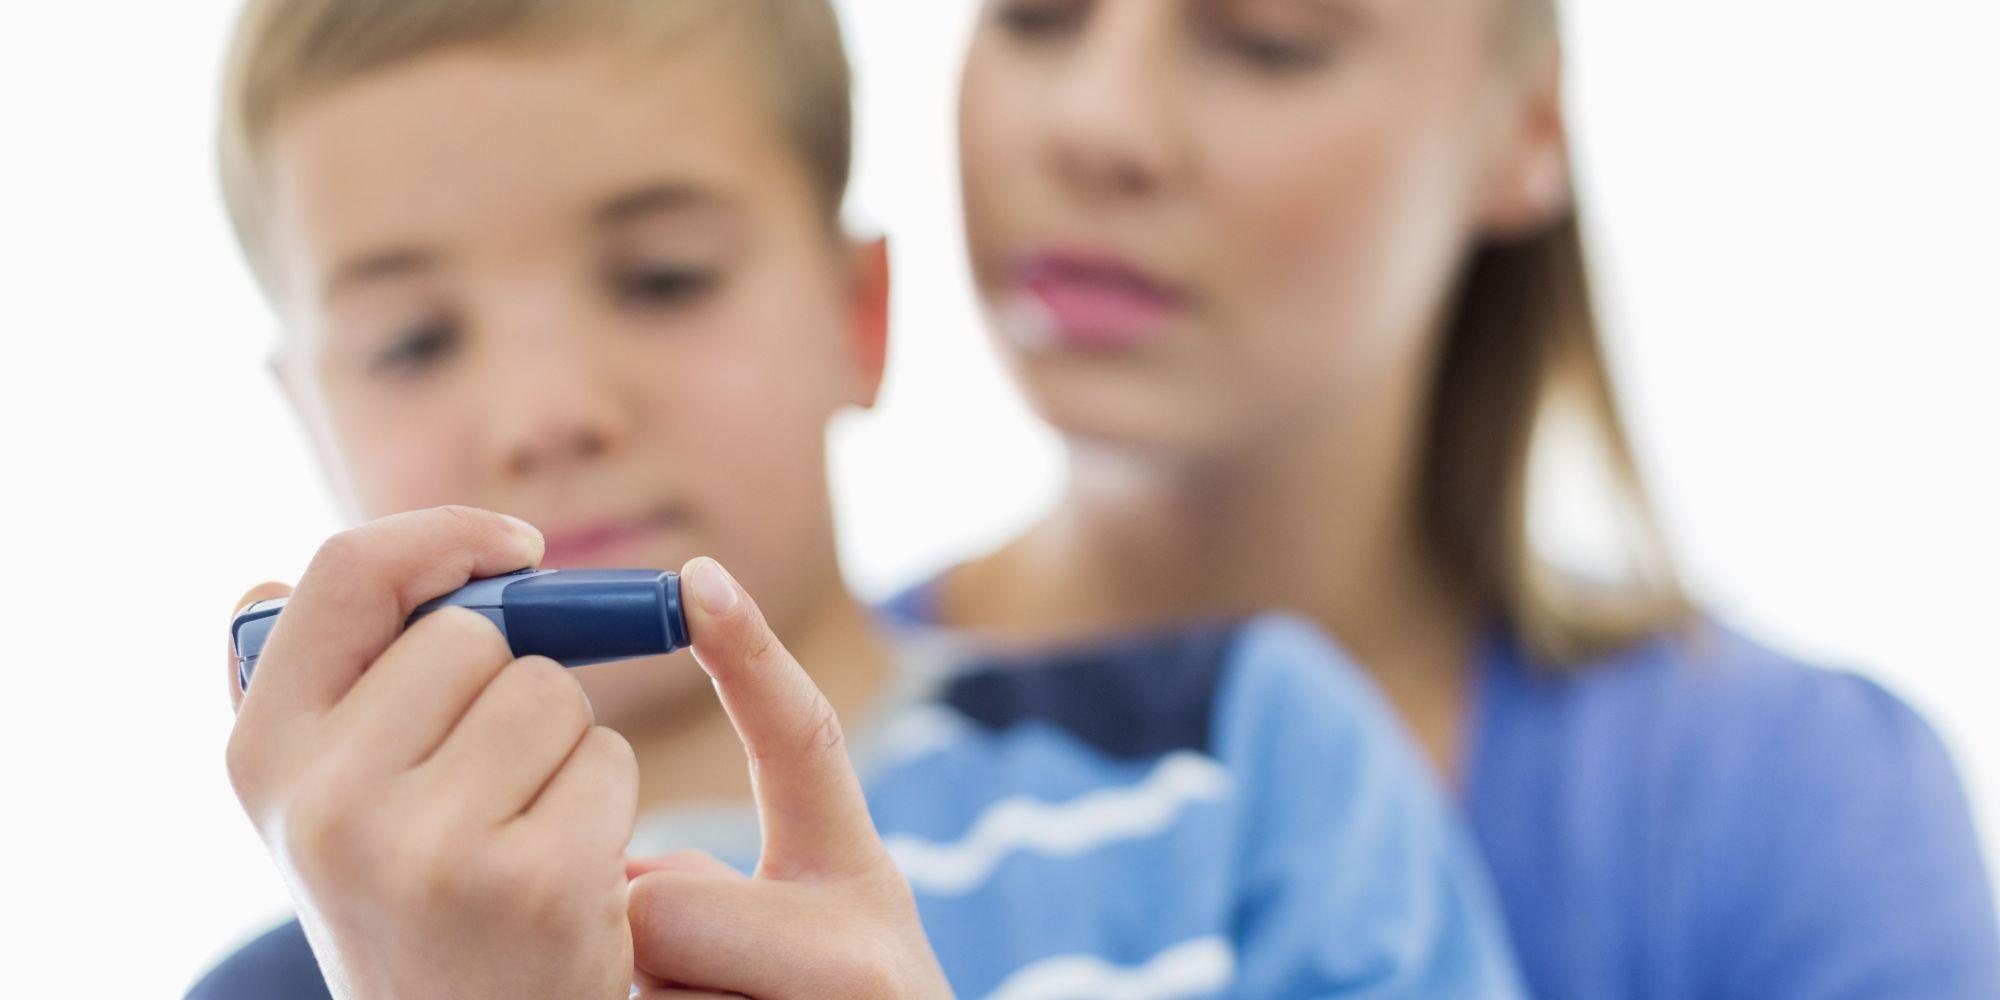 Aποτελεσματική η ινσουλίνη faster aspart σε παιδιά με διαβήτη τύπου 1